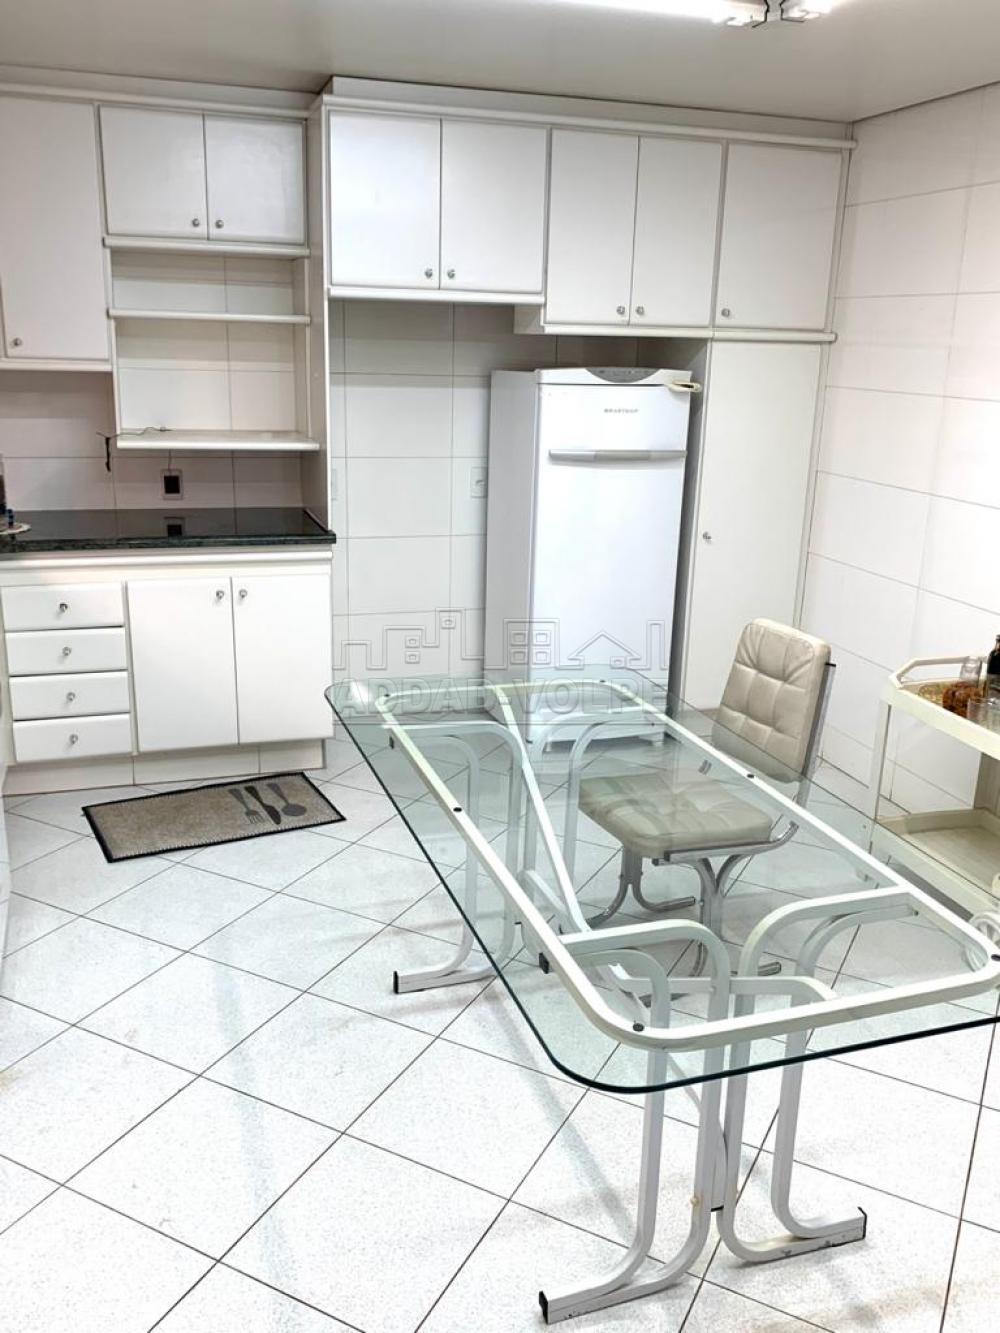 Alugar Casa / Sobrado em Bauru R$ 15.000,00 - Foto 14